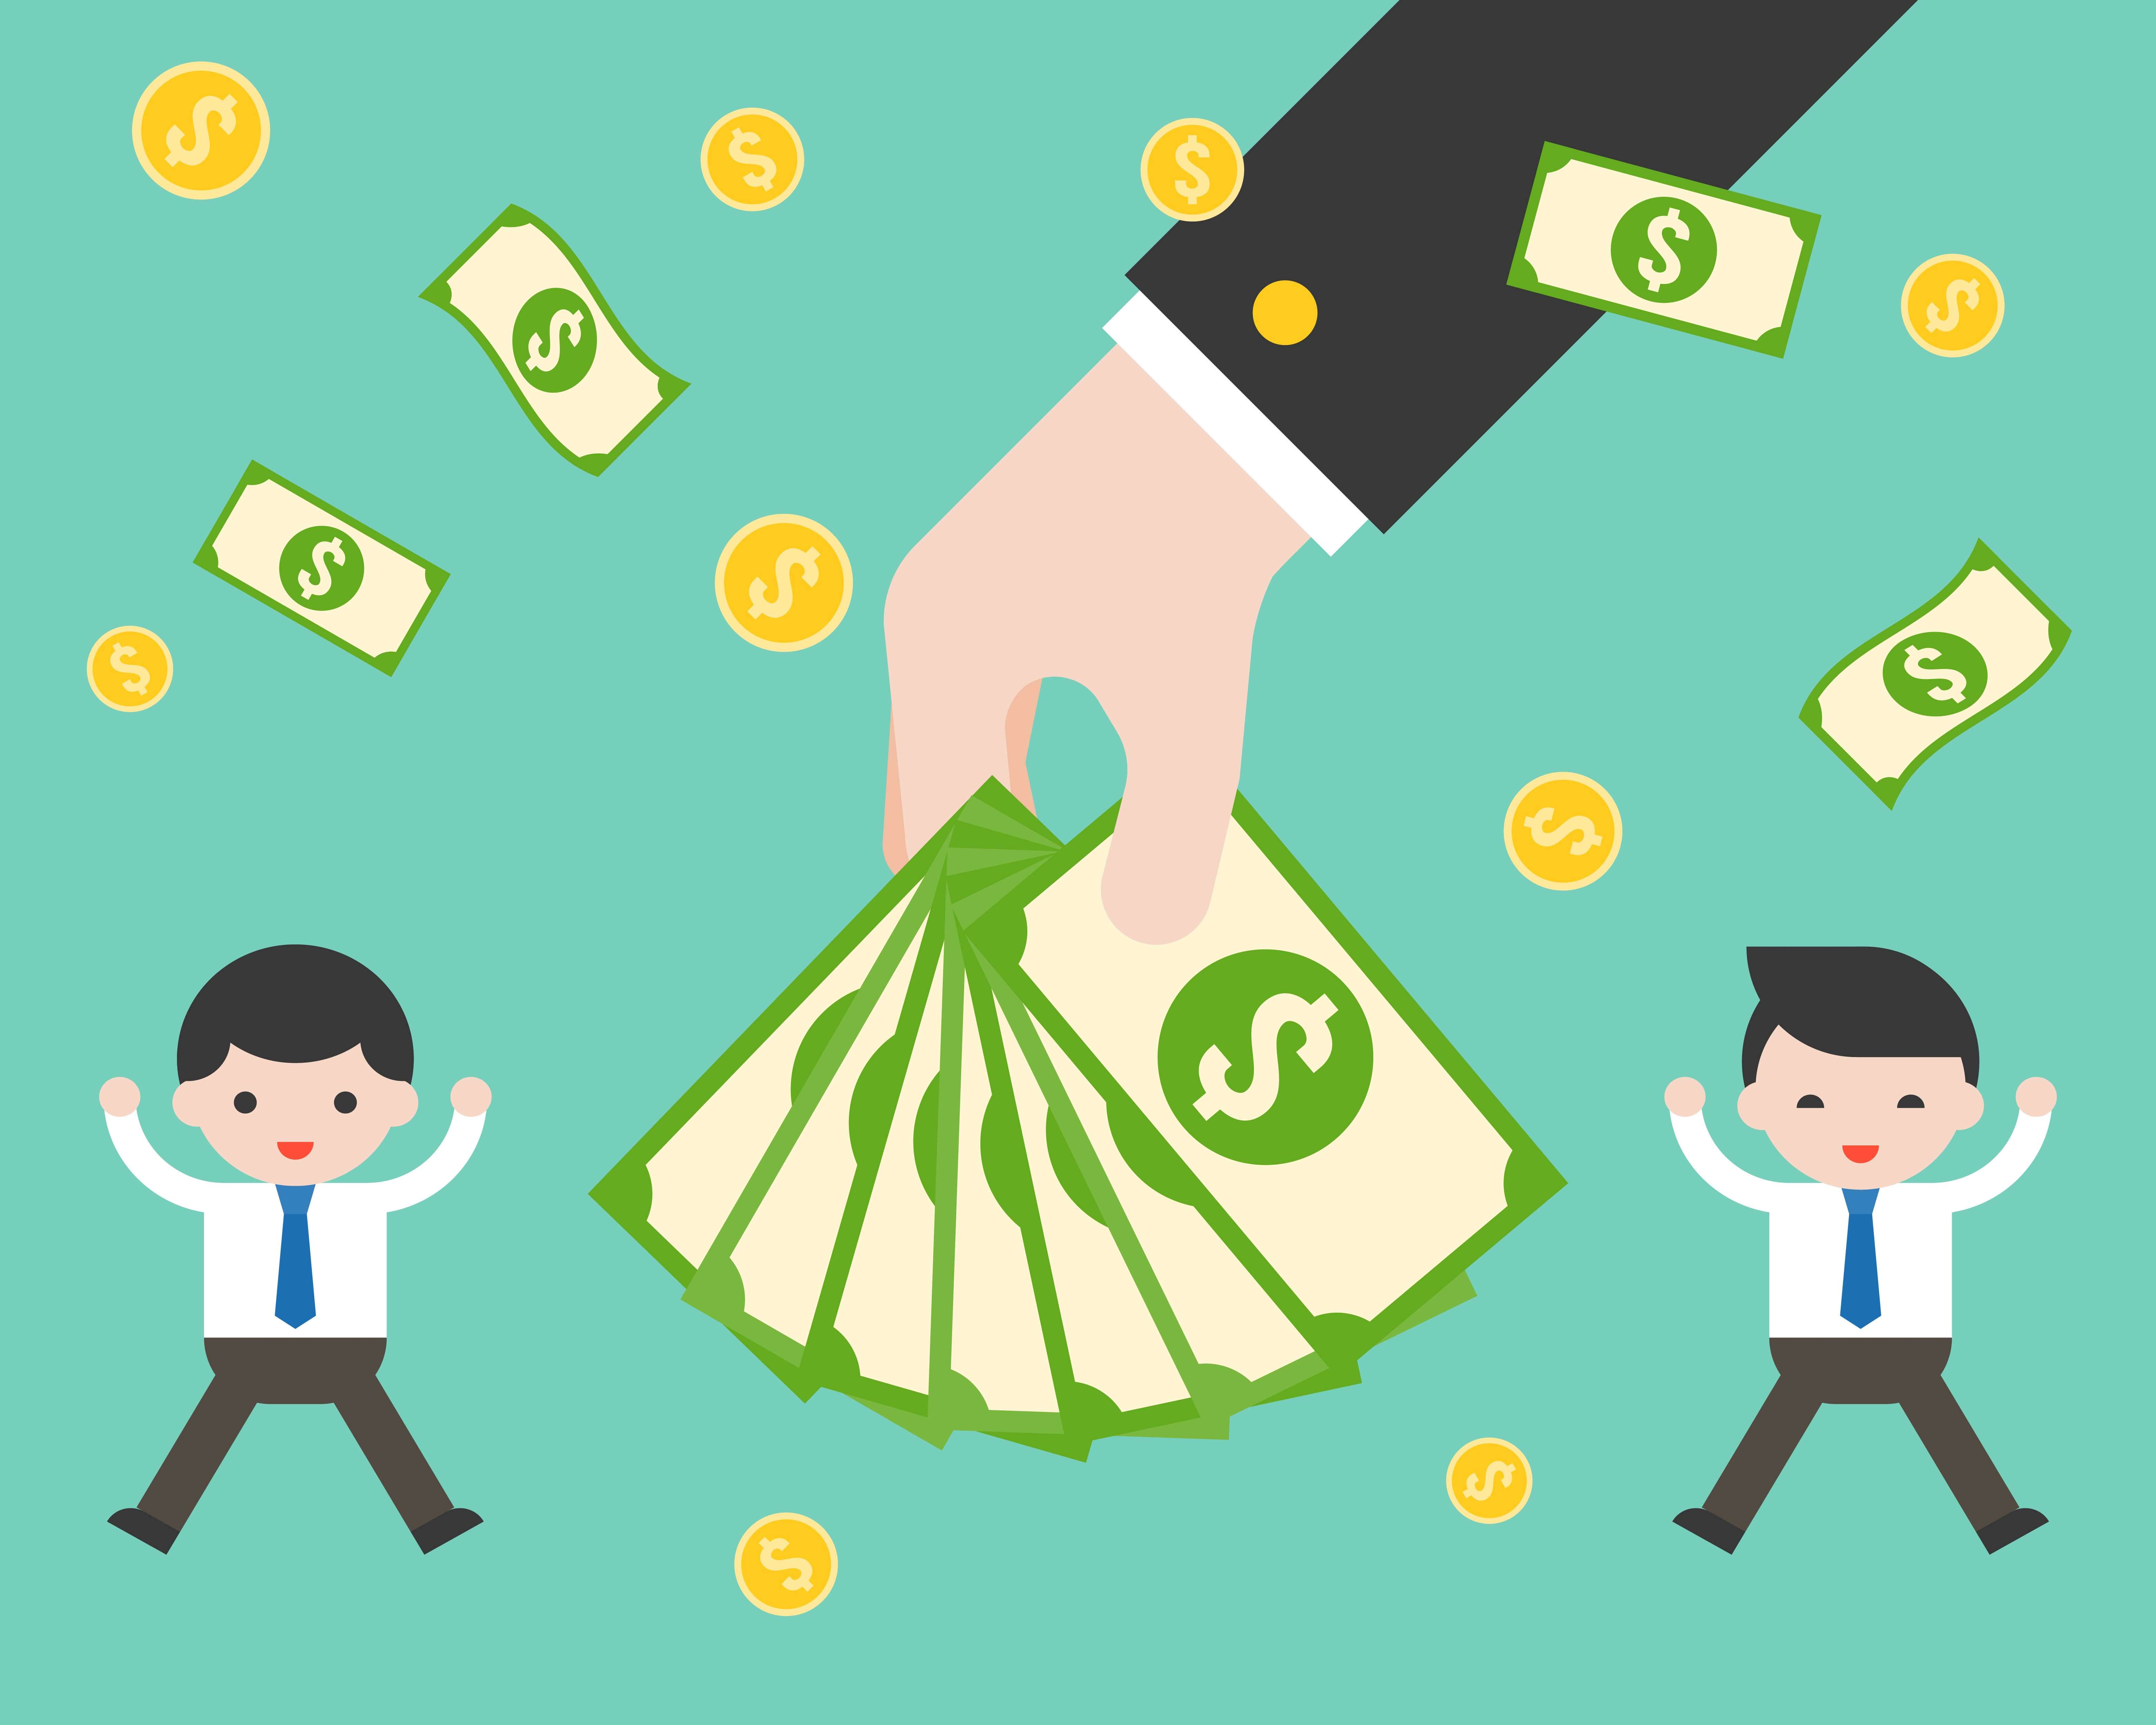 HotForex Welcome Trading Promotion - 30 USD No Deposit Bonus